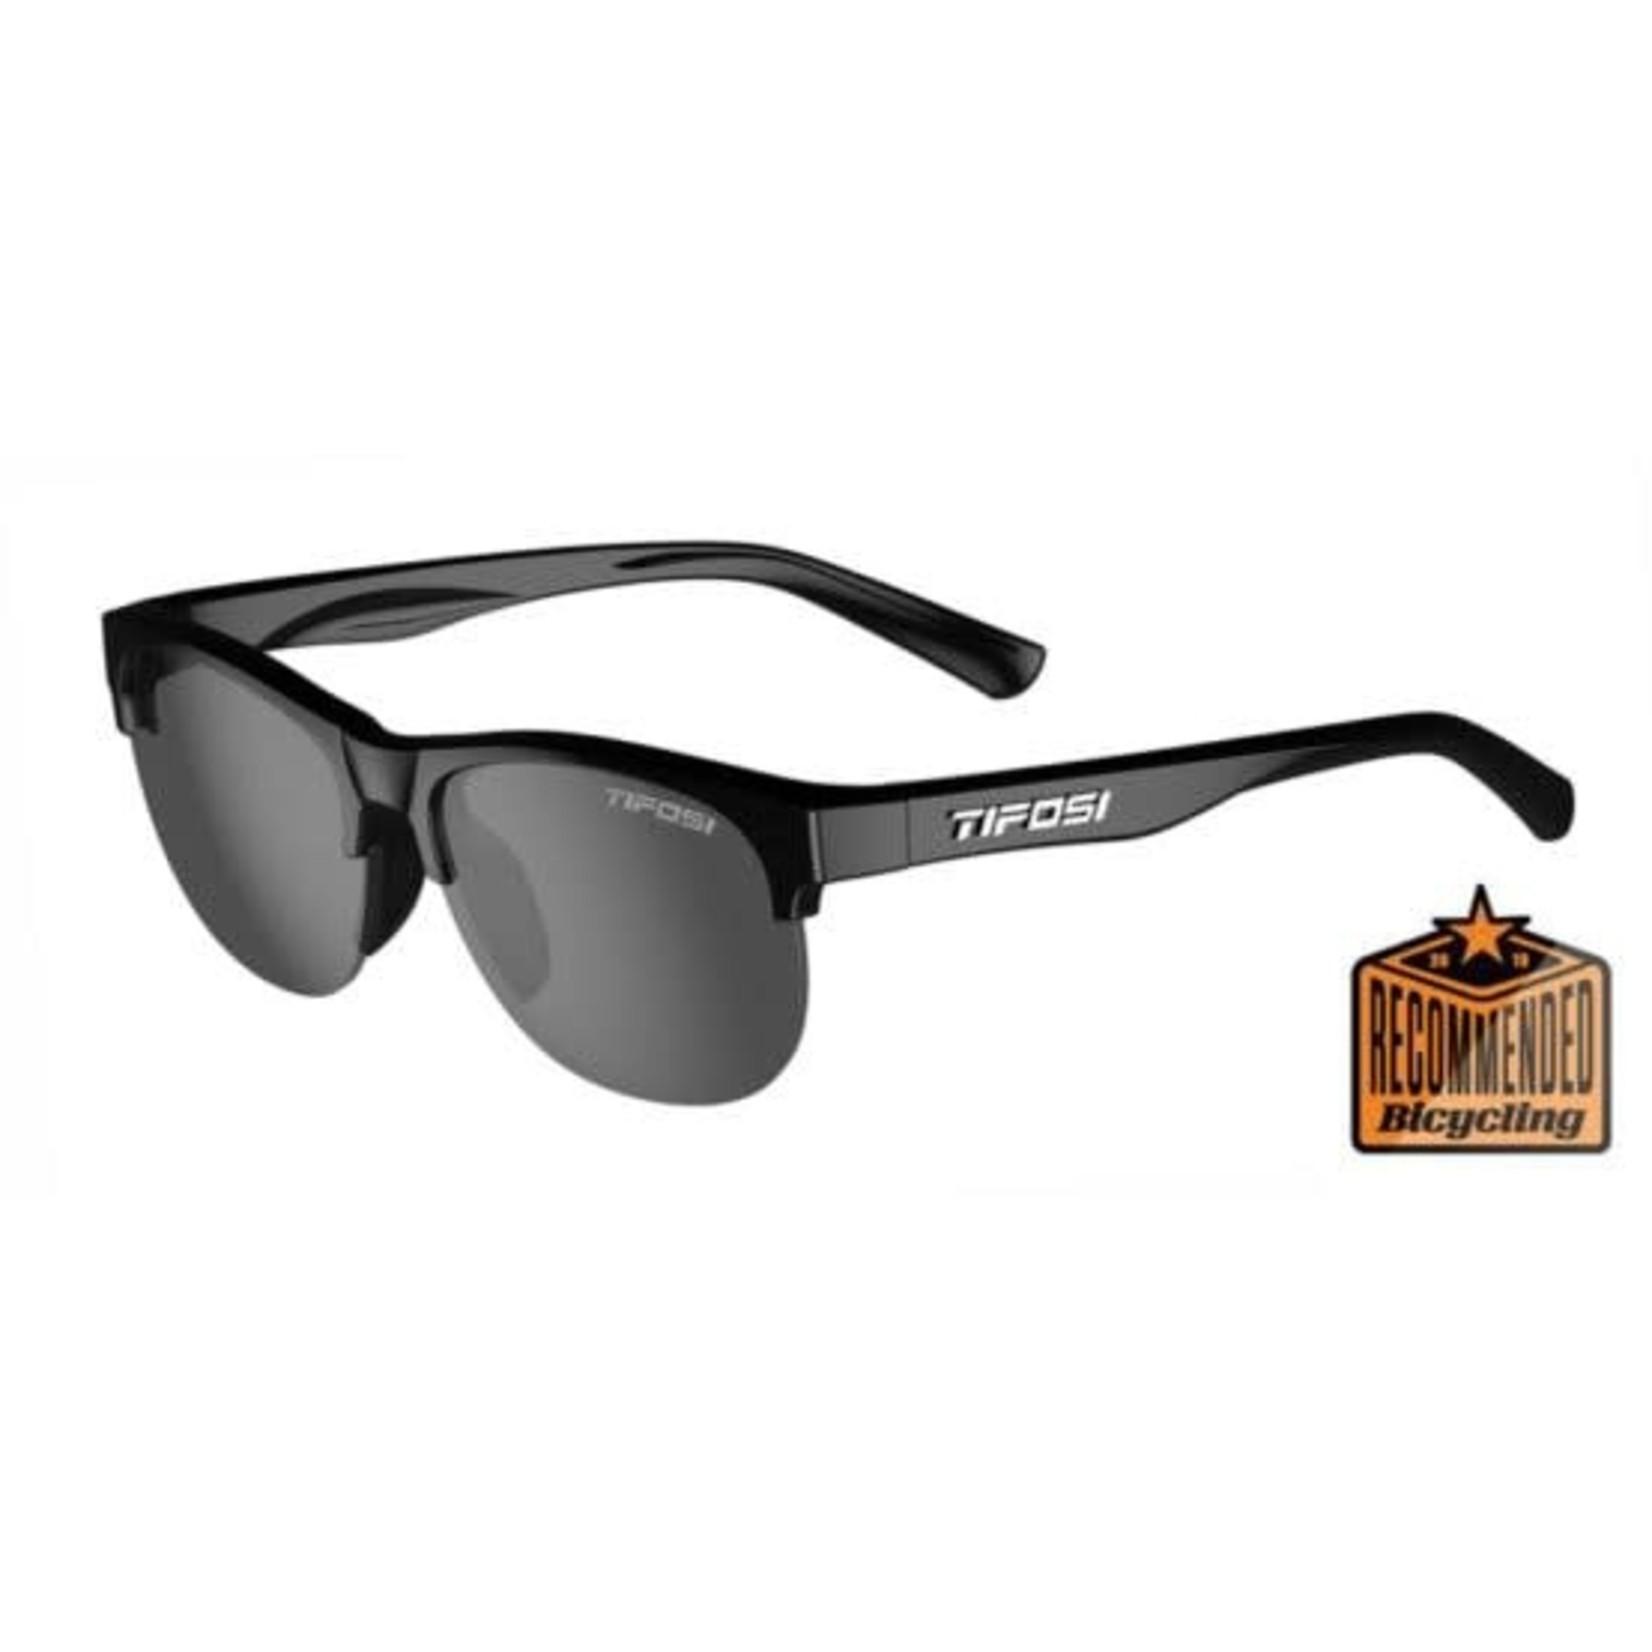 Tifosi Optics Swank SL, Gloss Black Single Lens Sunglasses